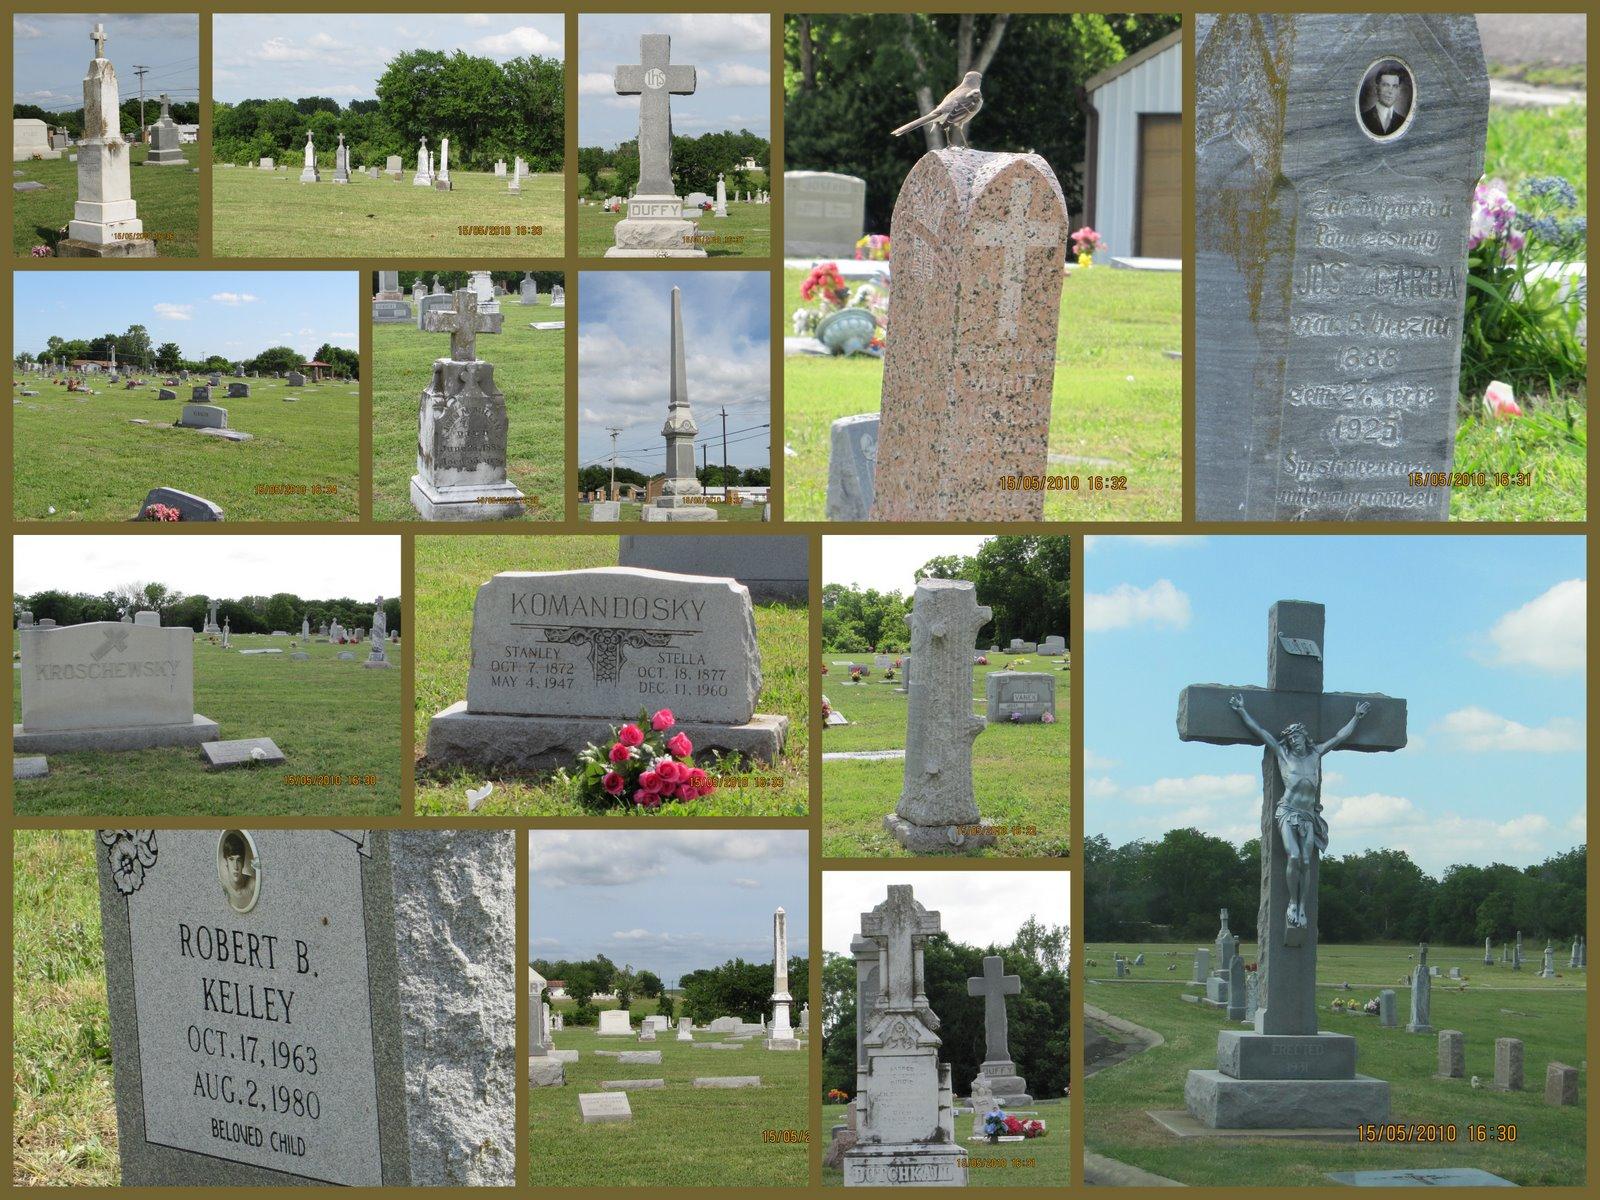 http://1.bp.blogspot.com/-ChCXnZkYRd0/TVn_6fX0fWI/AAAAAAAAJNU/JcyyGmpBNHM/s1600/2010-05-15%2BTaylor%2BCatholic_Cemetery.jpg